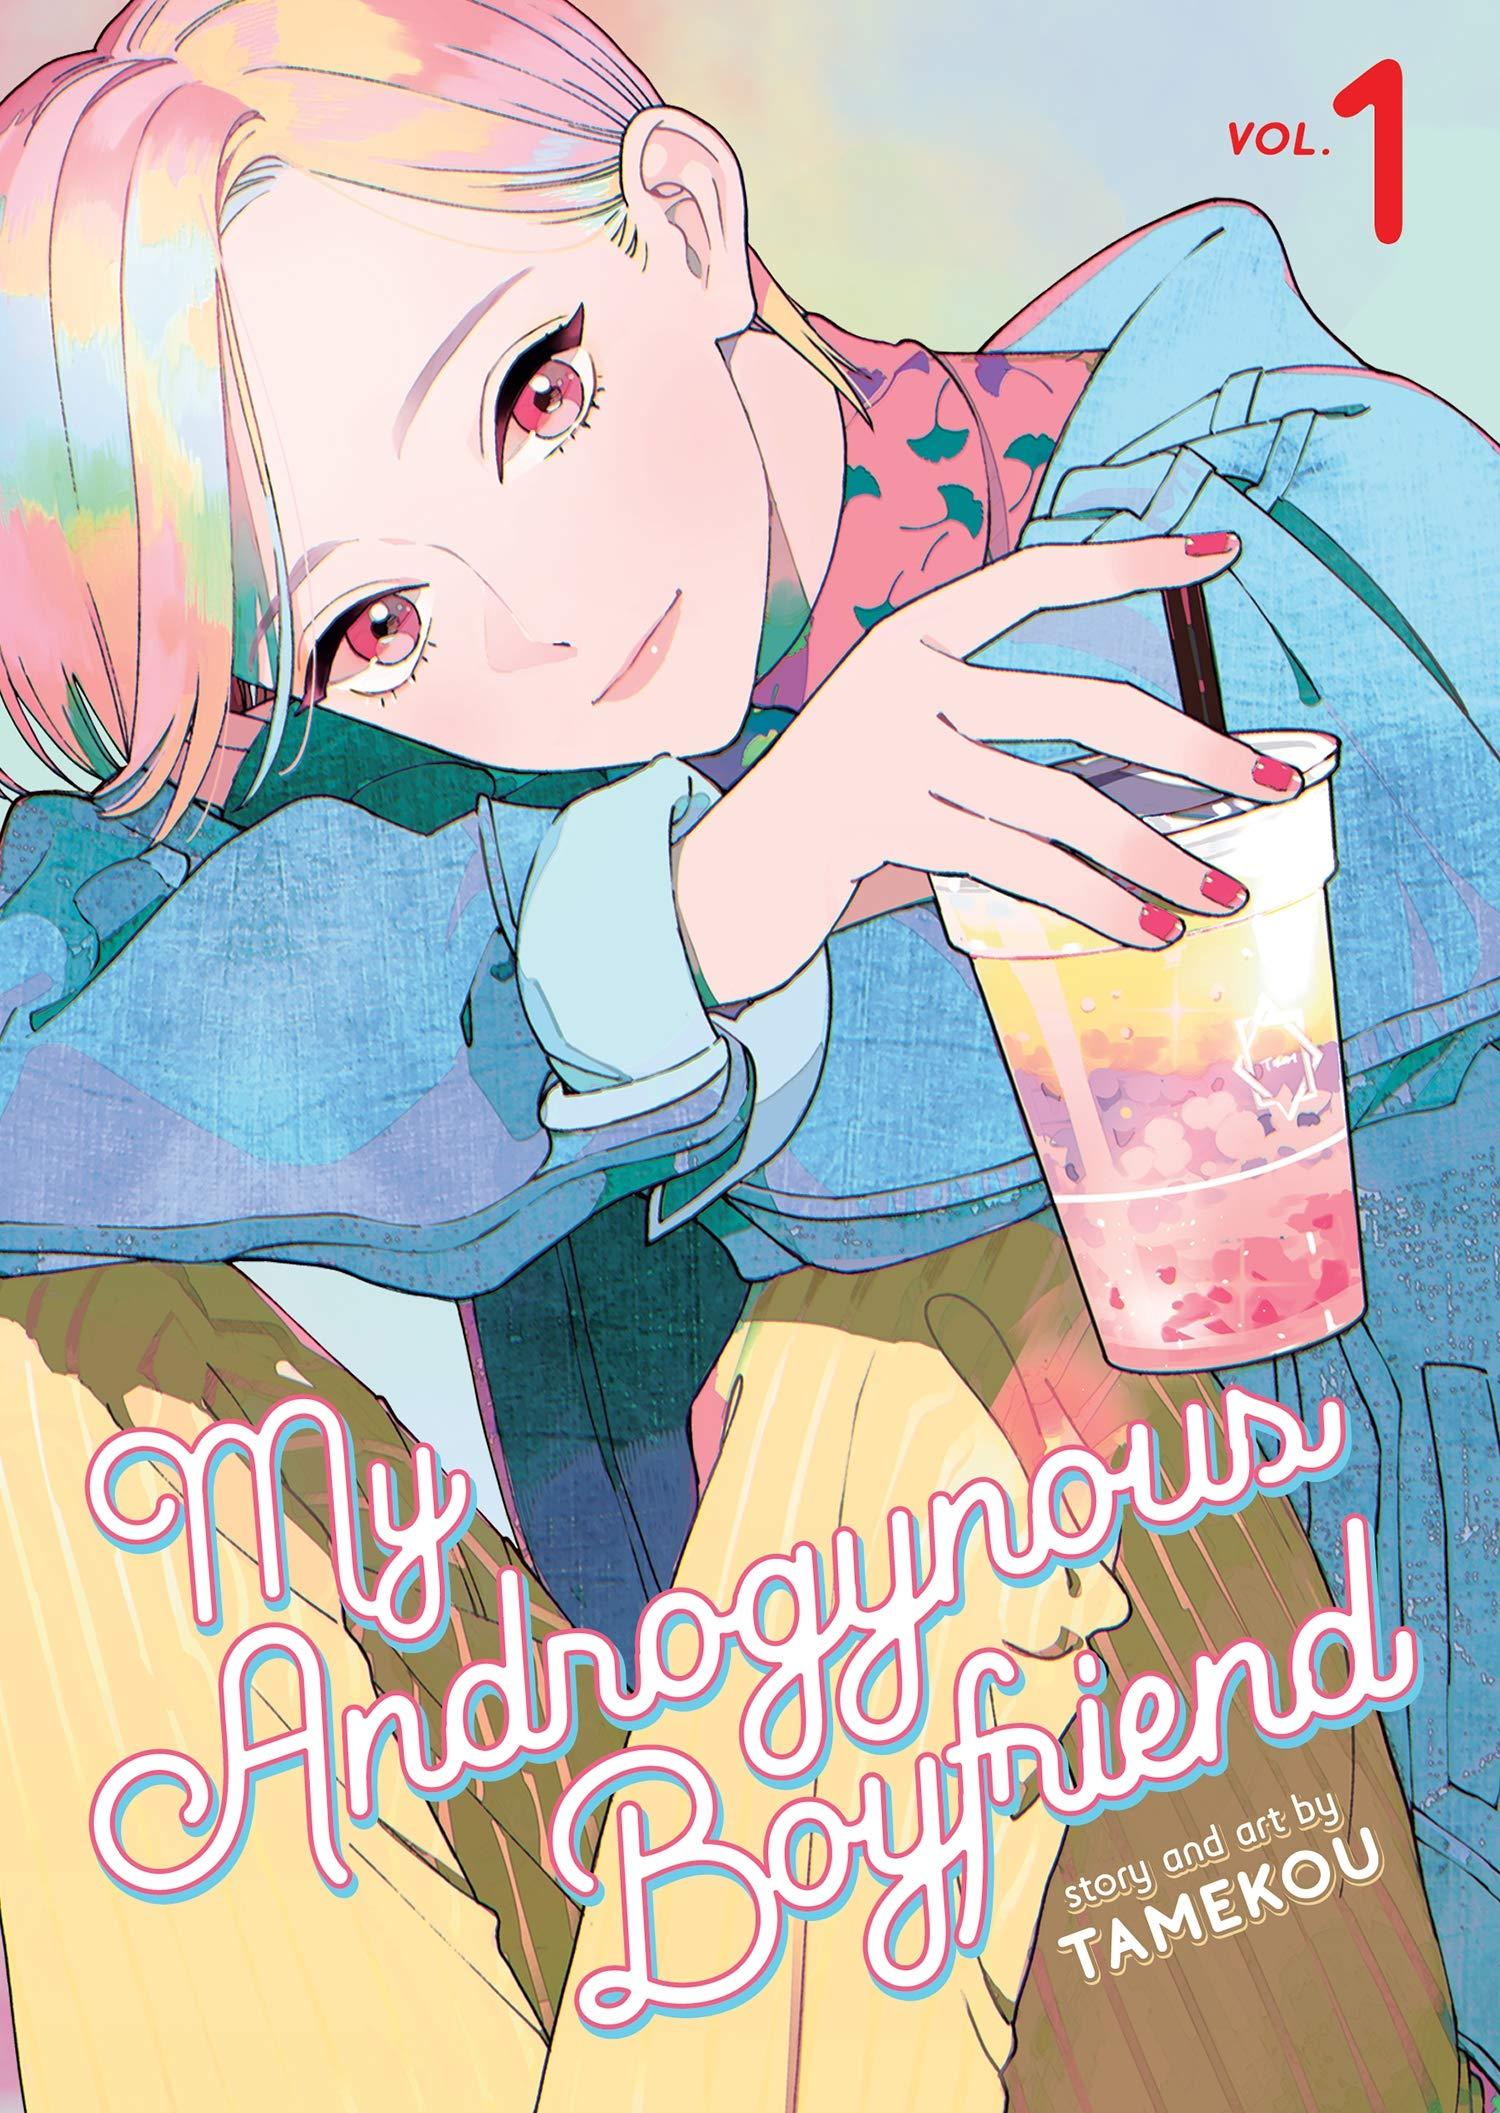 My Androgynous Boyfriend, Vol. 1